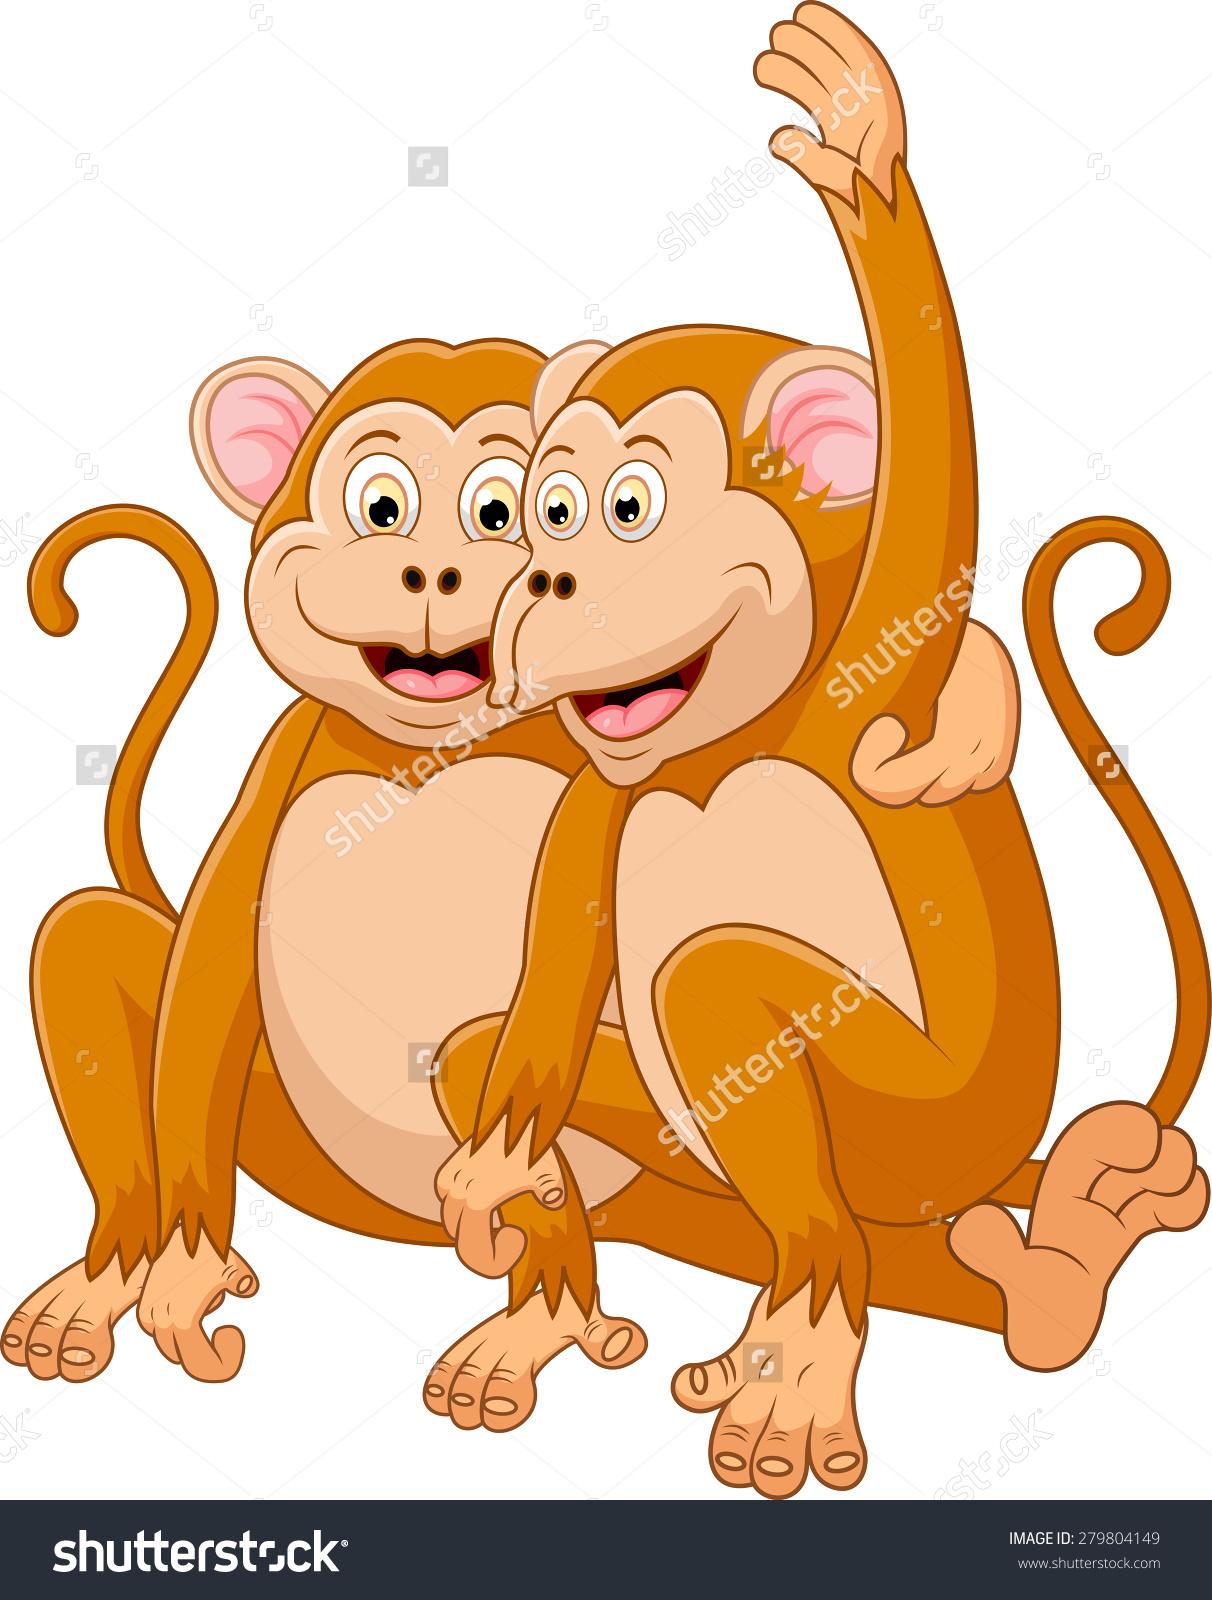 Two Monkeys Cartoon Relaxing Stock Illustration 279804149.